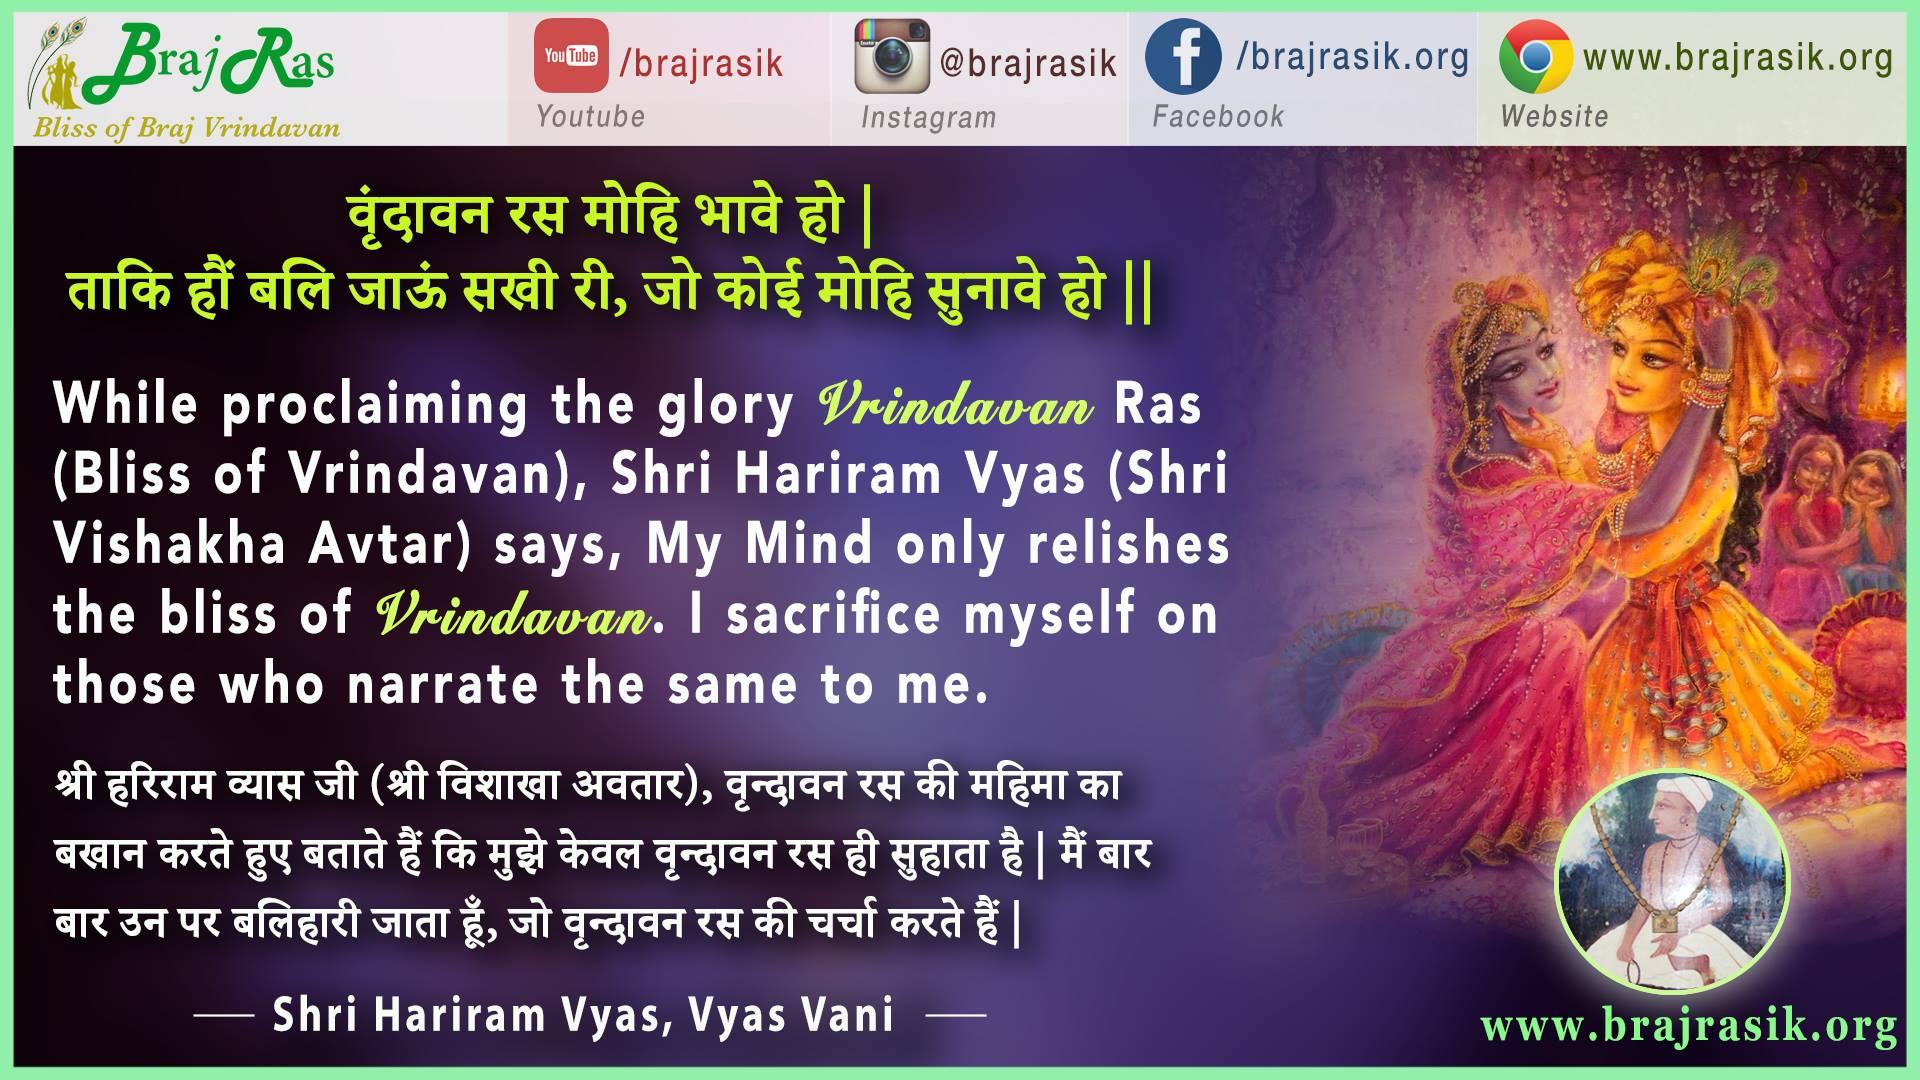 Vrindavan Ras Mohi Bhaave Ho  - By Shri Hariram Vyas from Vyas Vani.